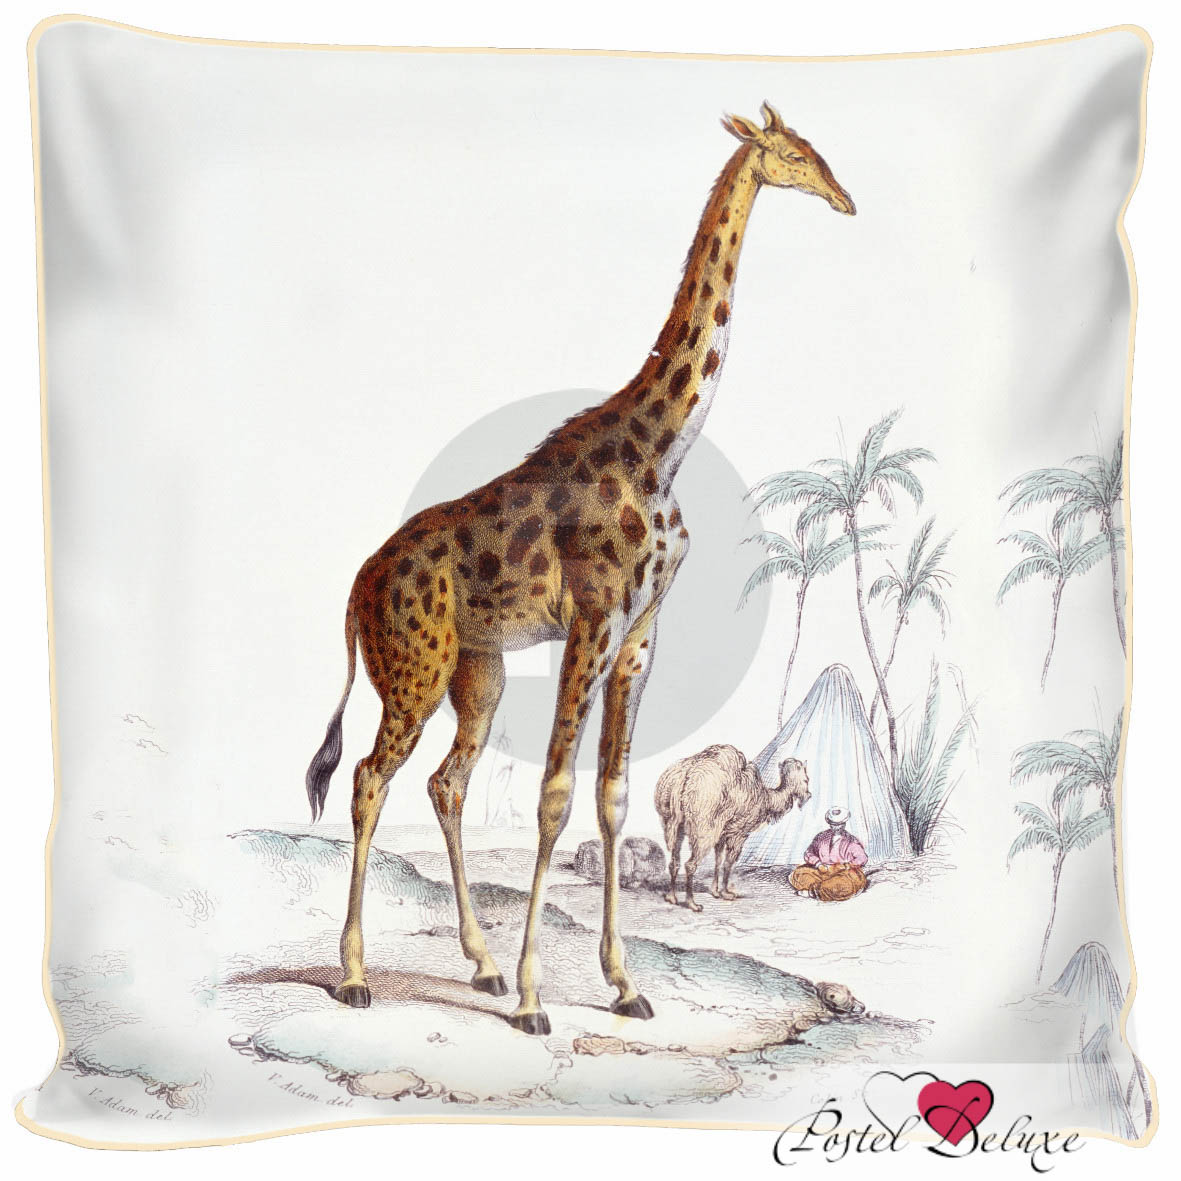 Декоративные подушки Fototende Декоративная подушка Жираф (45х45) подушки декоративные maxitoys подушка подголовник жираф